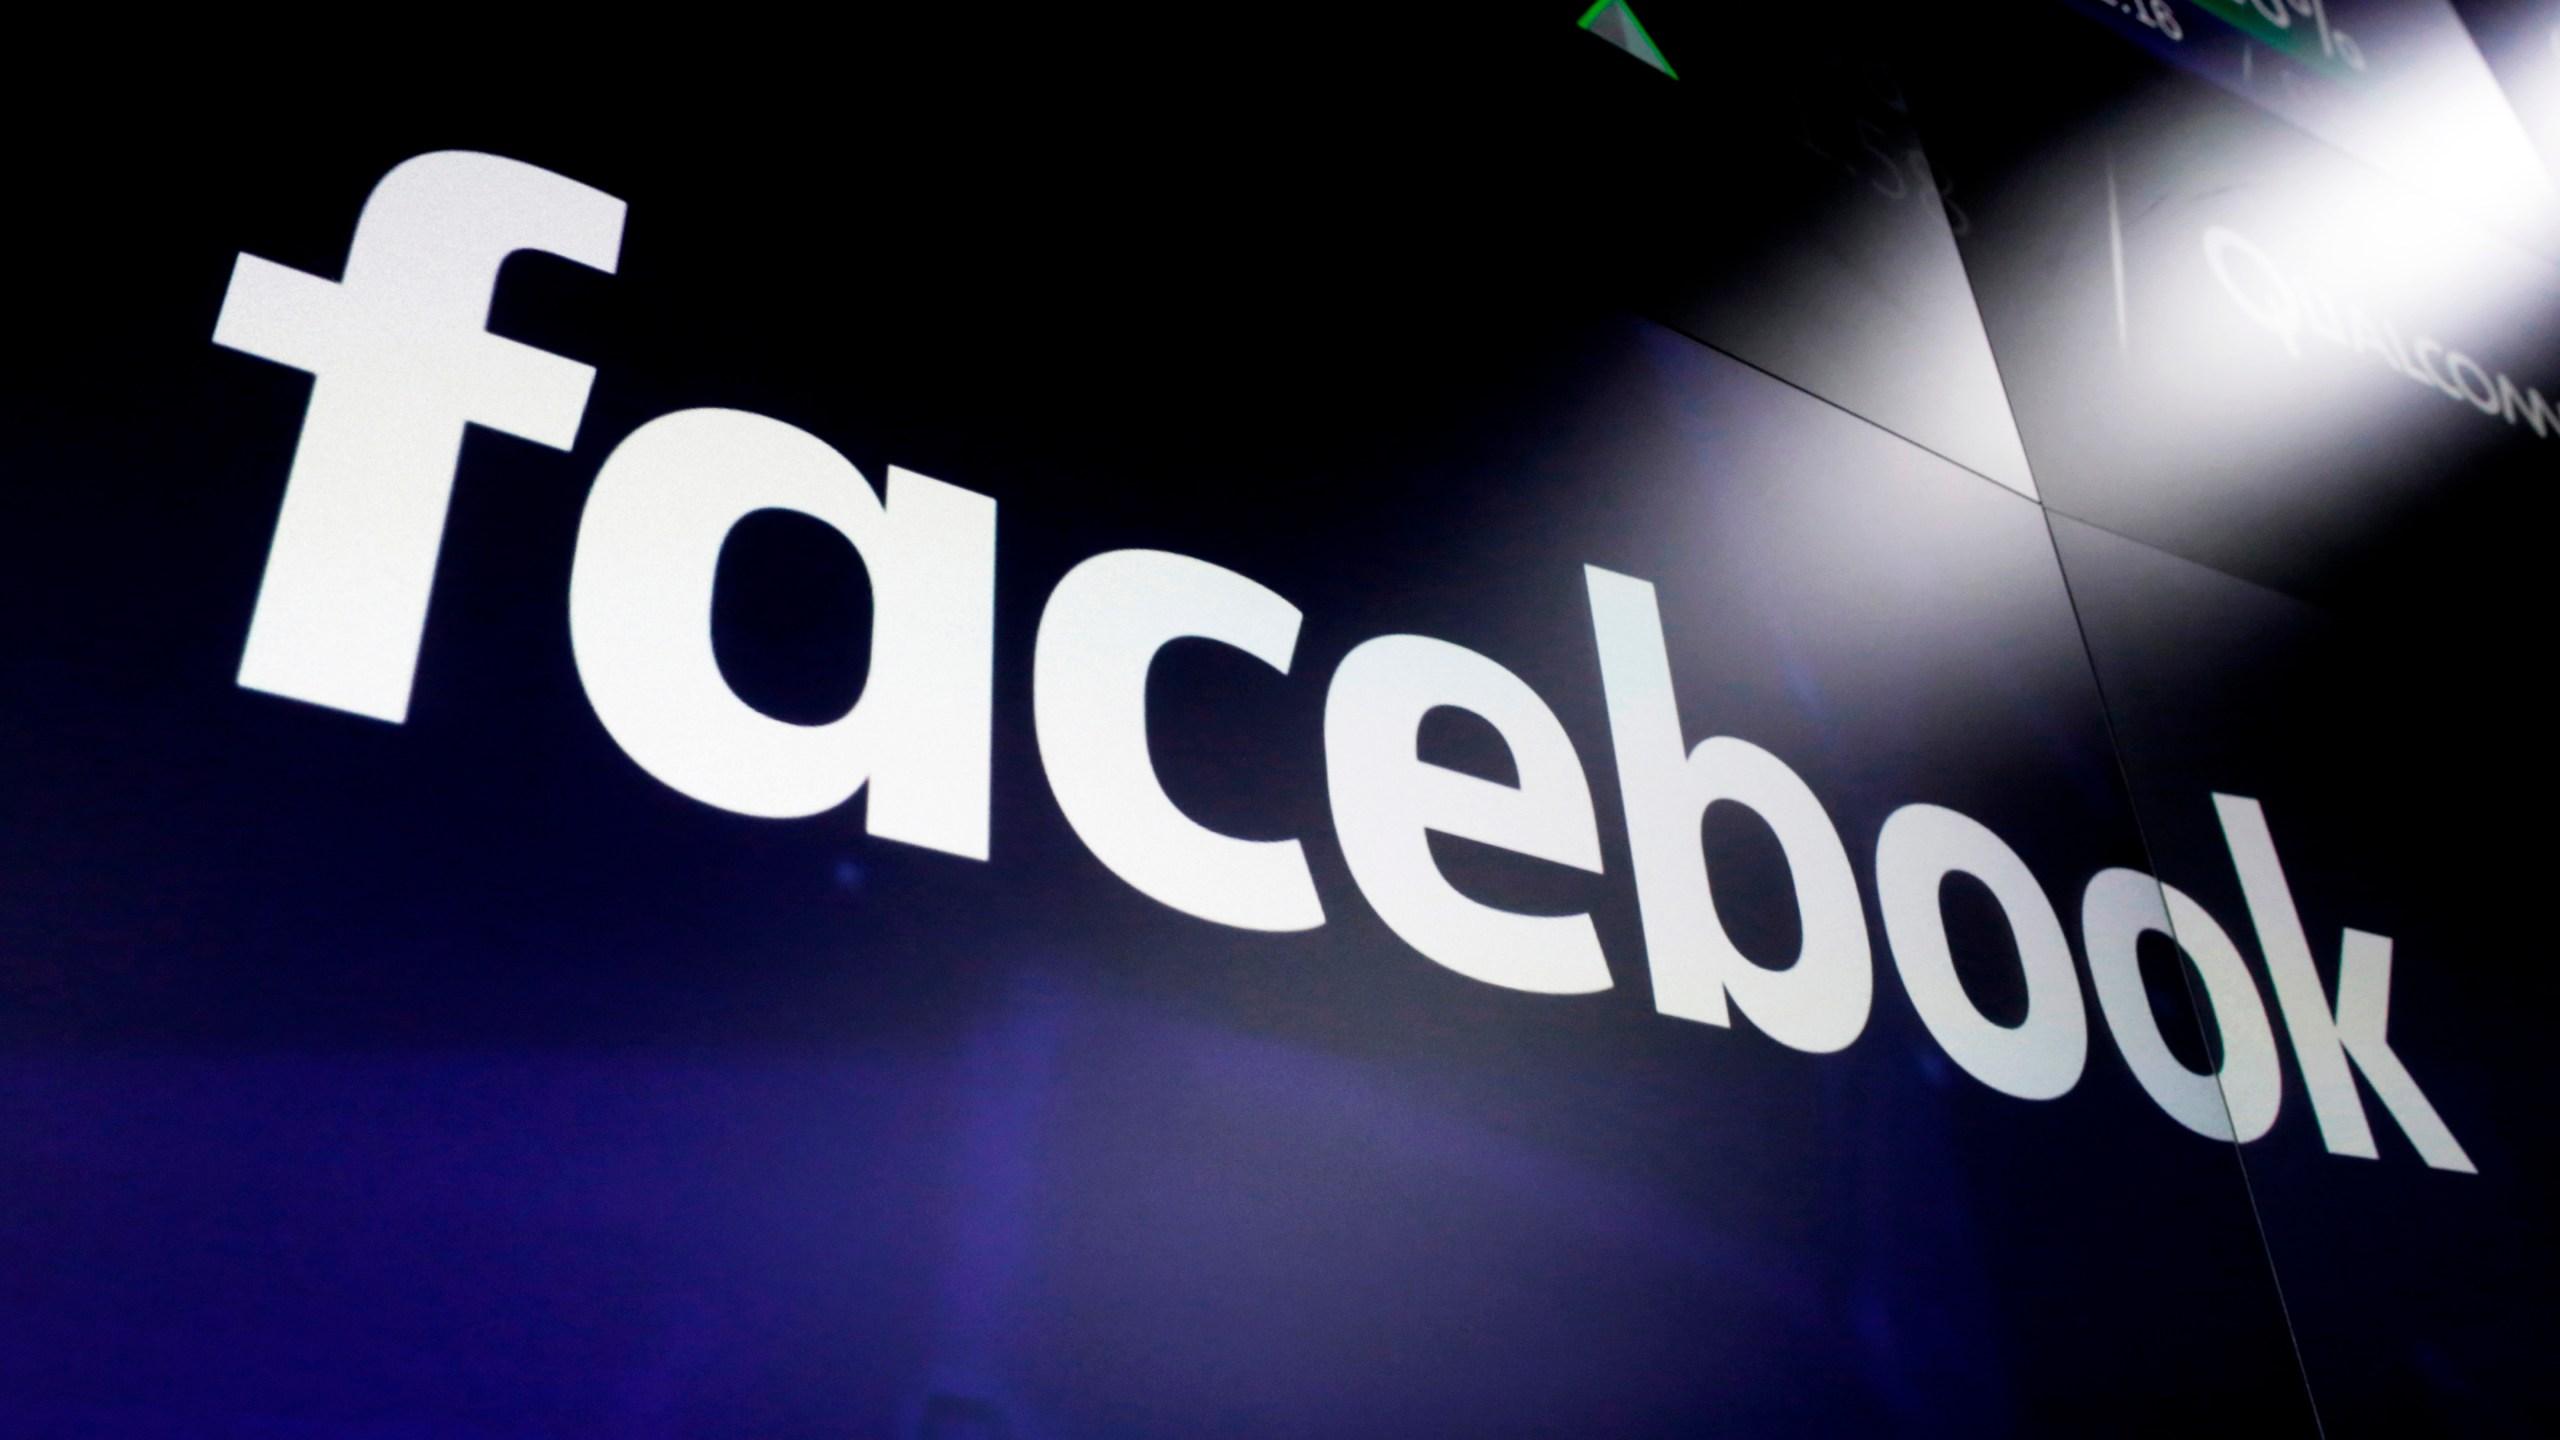 Facebook-Housing_Discrimination_40066-159532.jpg41758431